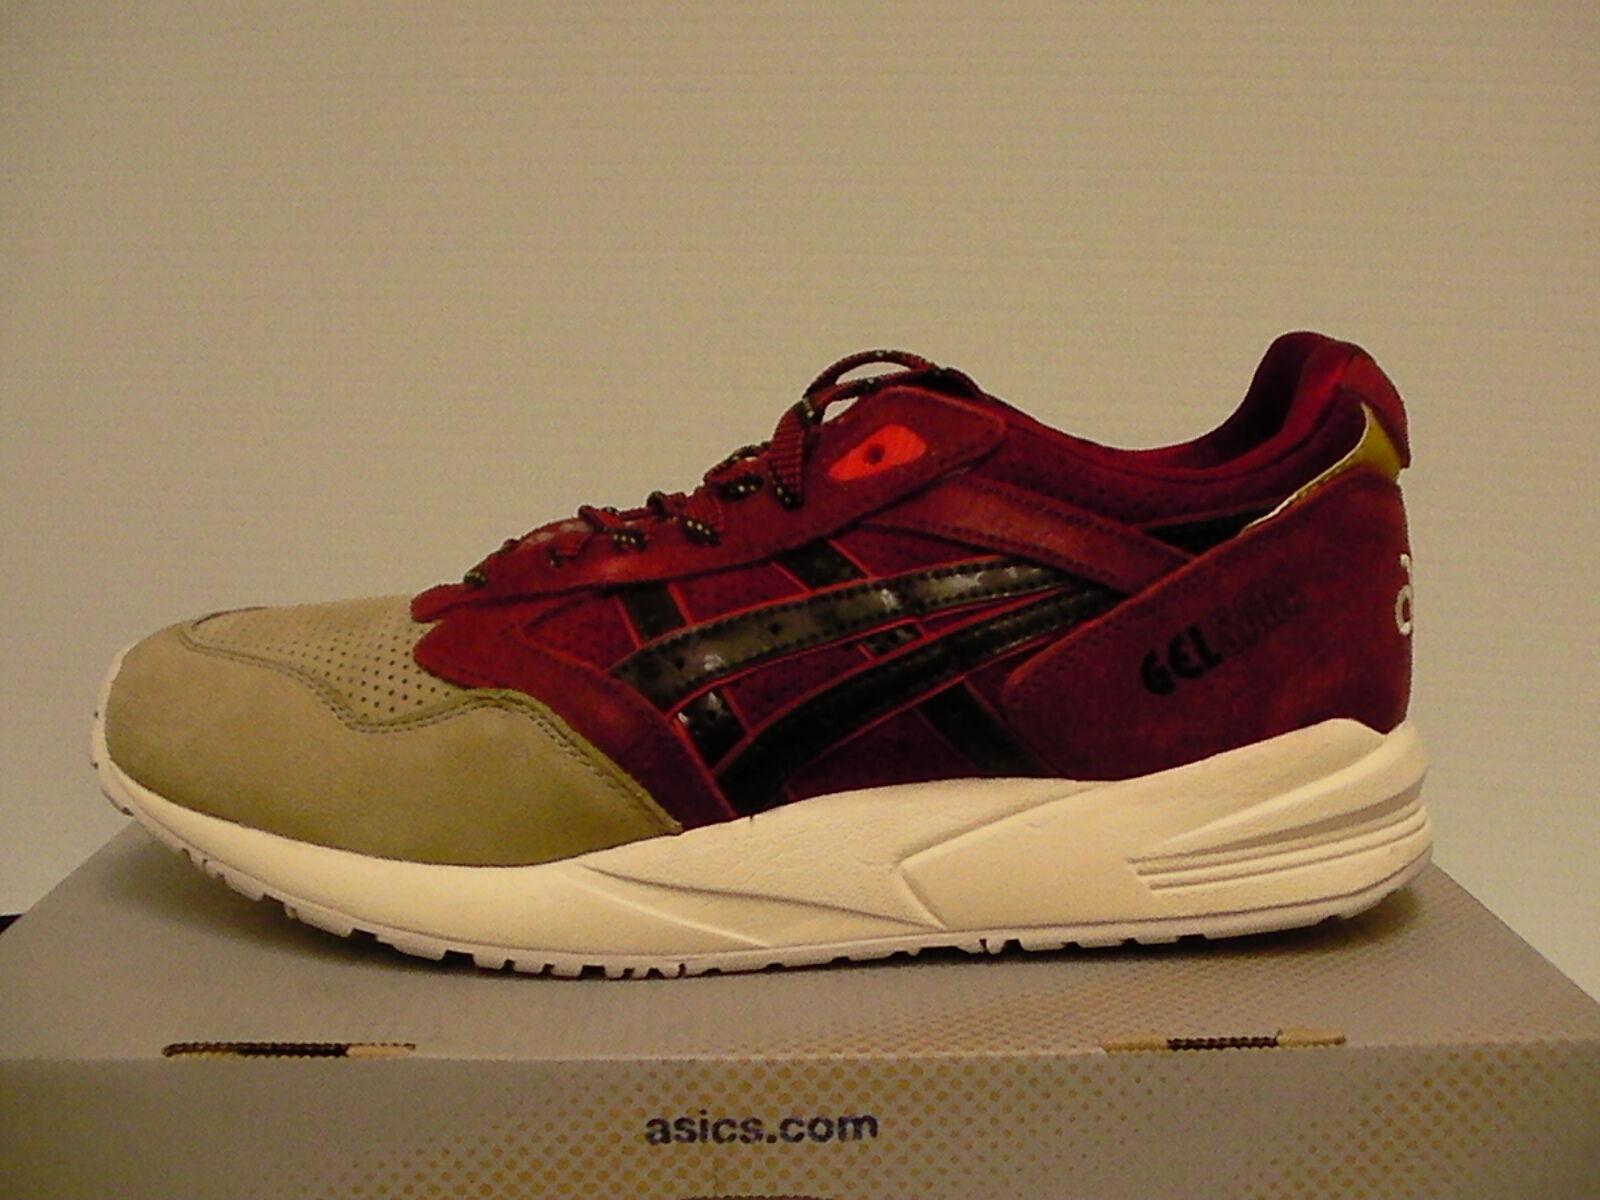 Asics shoes gel saga burgundy dark brown size 8.5 us men new with box